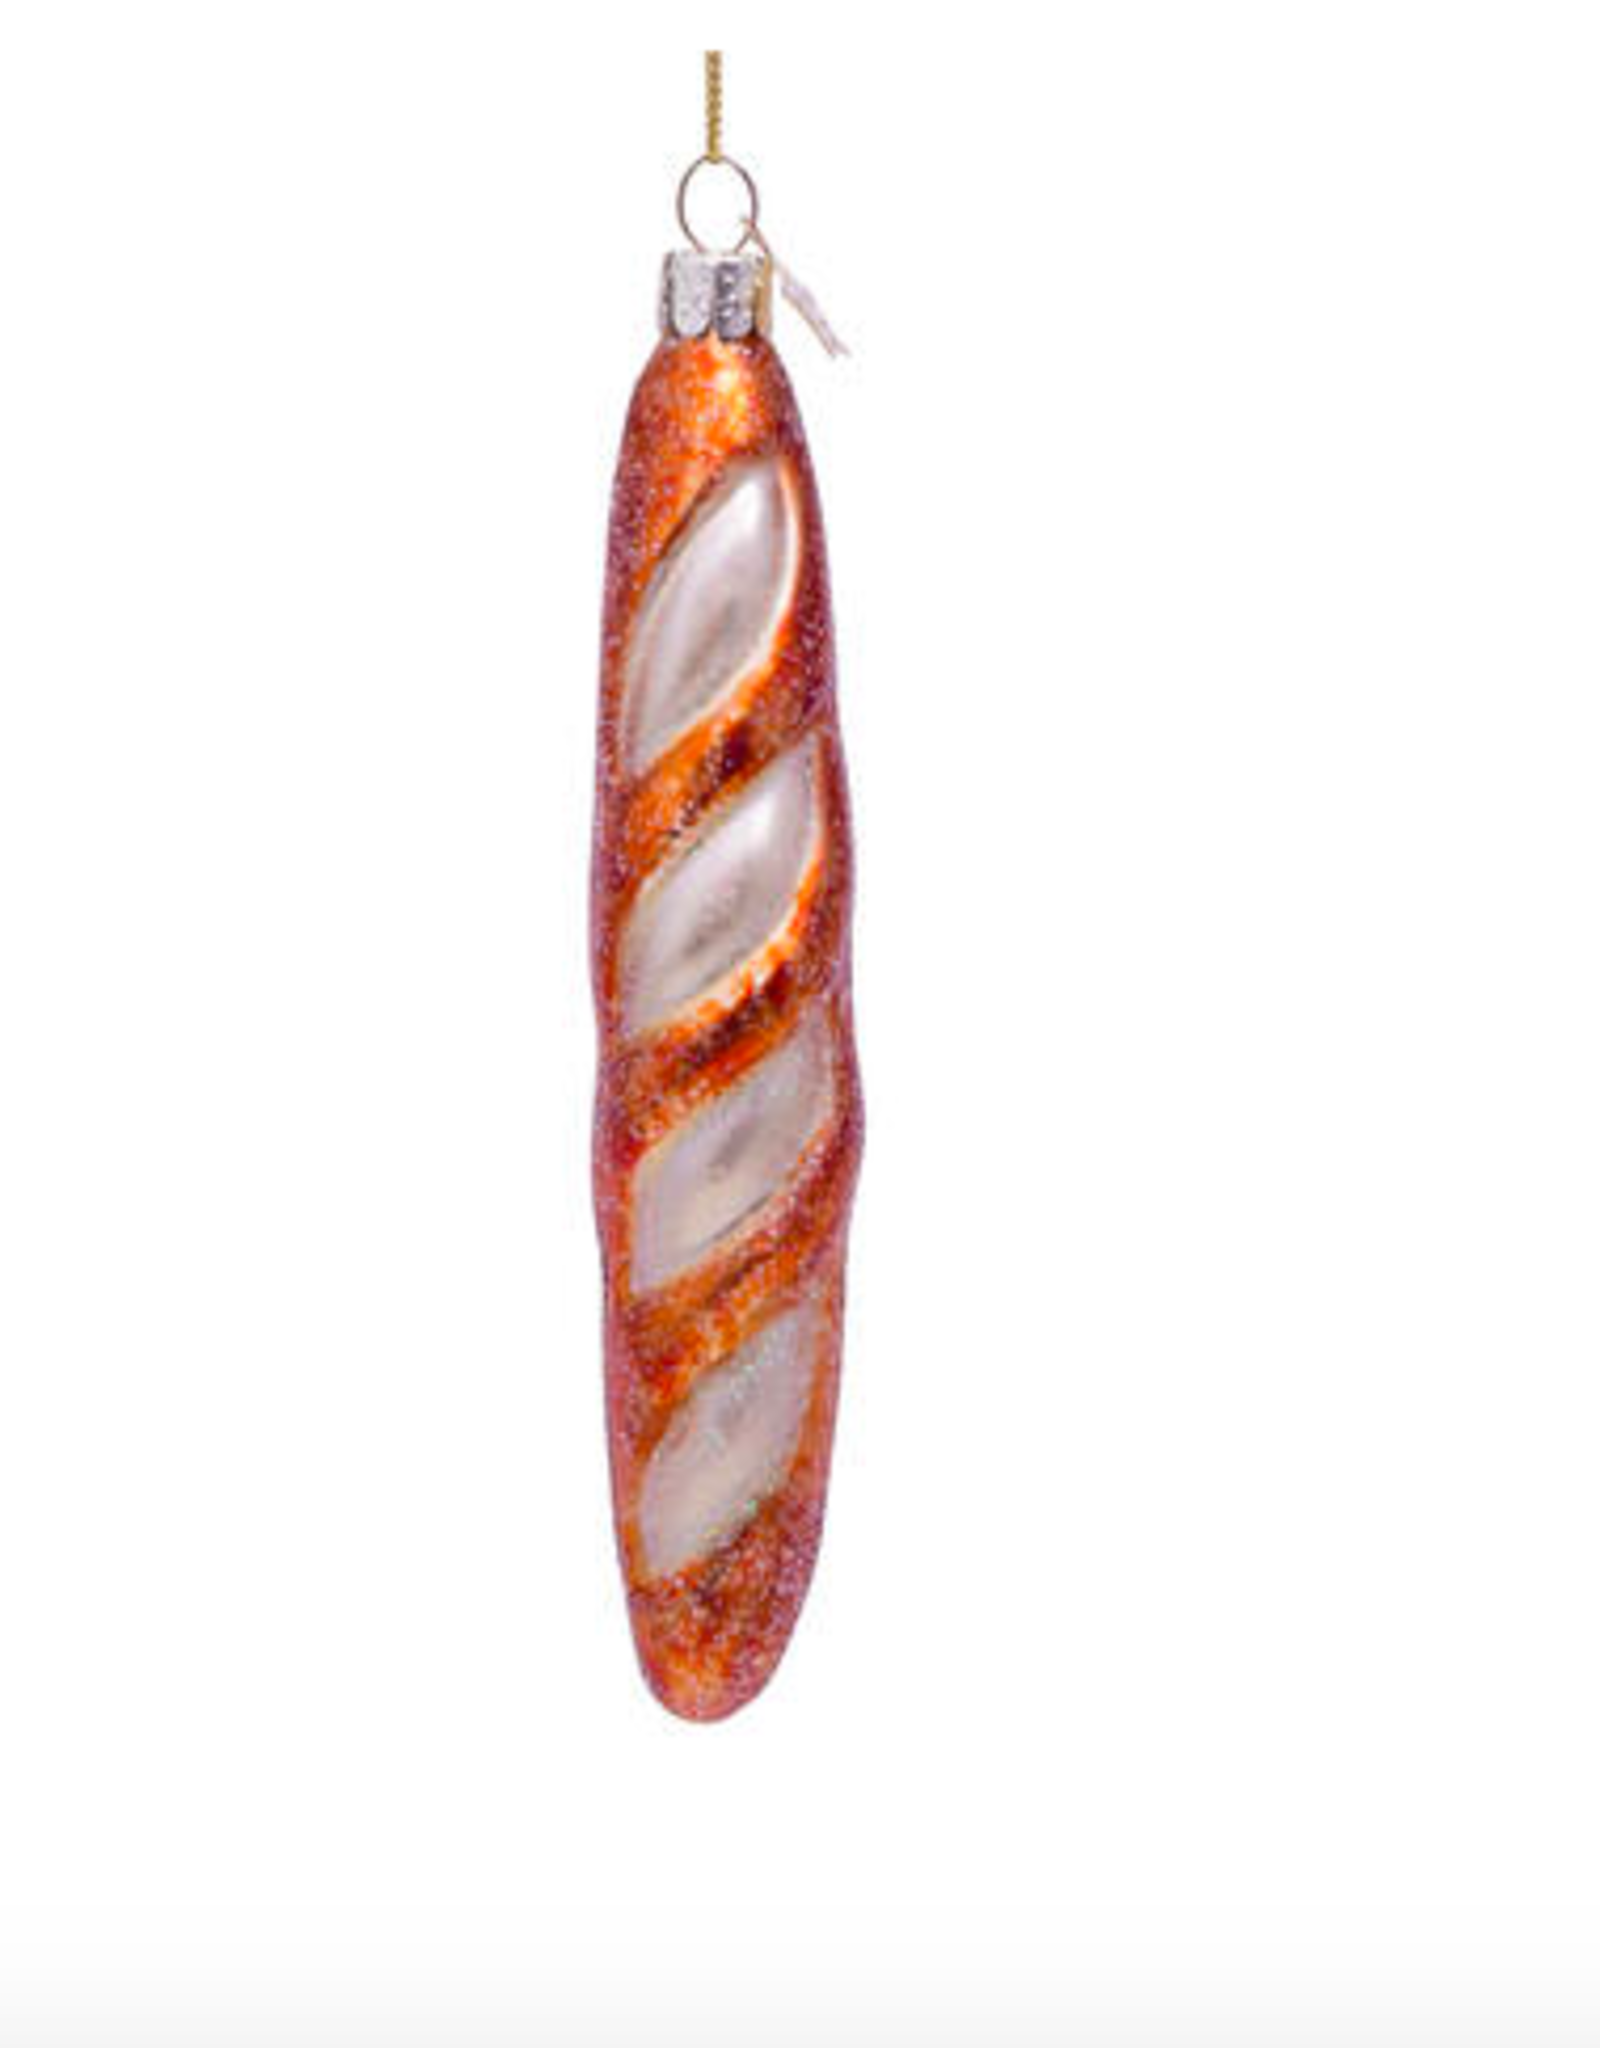 Vondels French baguette christmas ornament